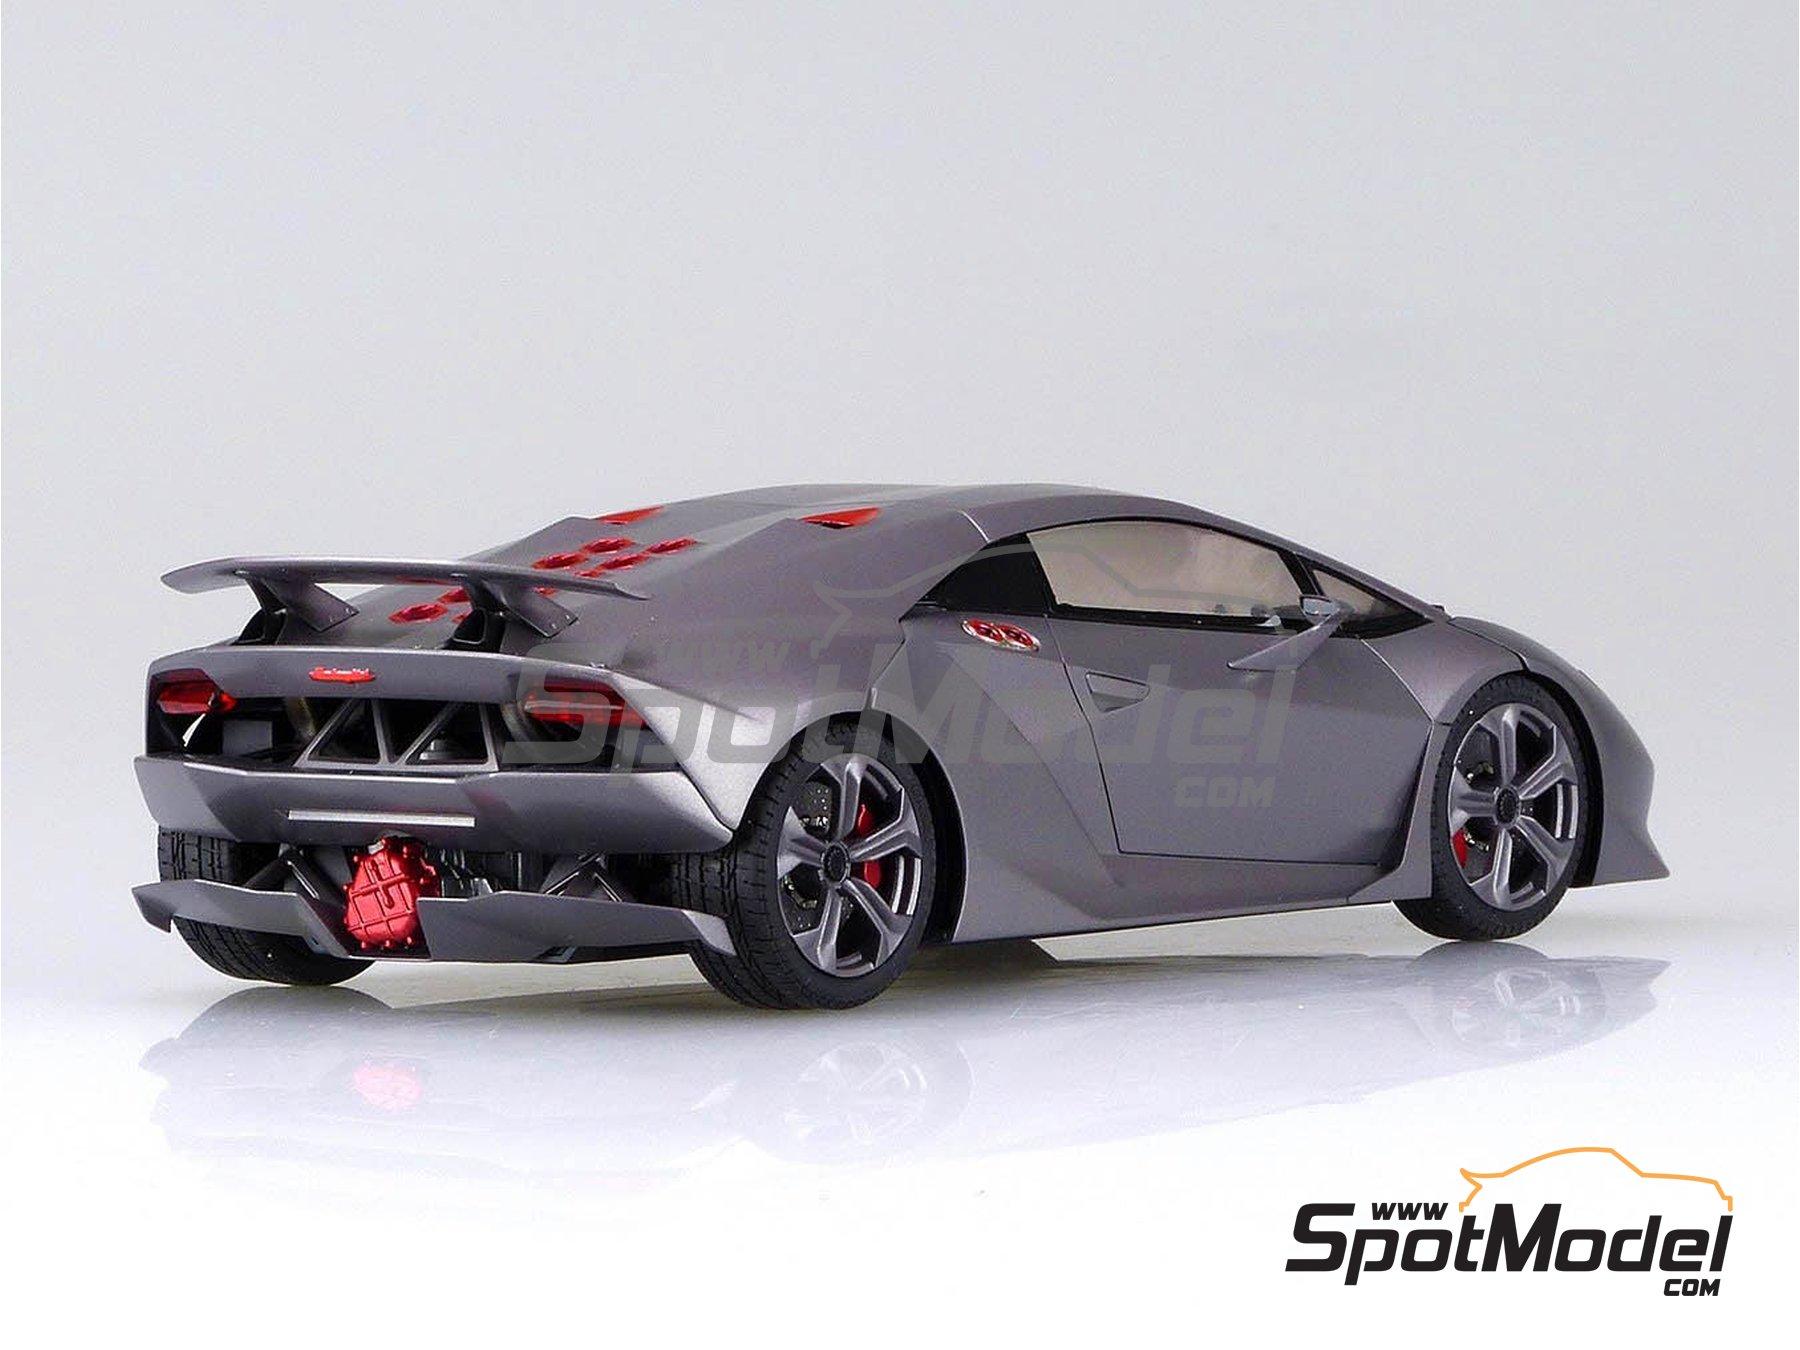 Superieur ... Image 3: Lamborghini Sesto Elemento | Model Car Kit In 1/24 Scale  Manufactured ...